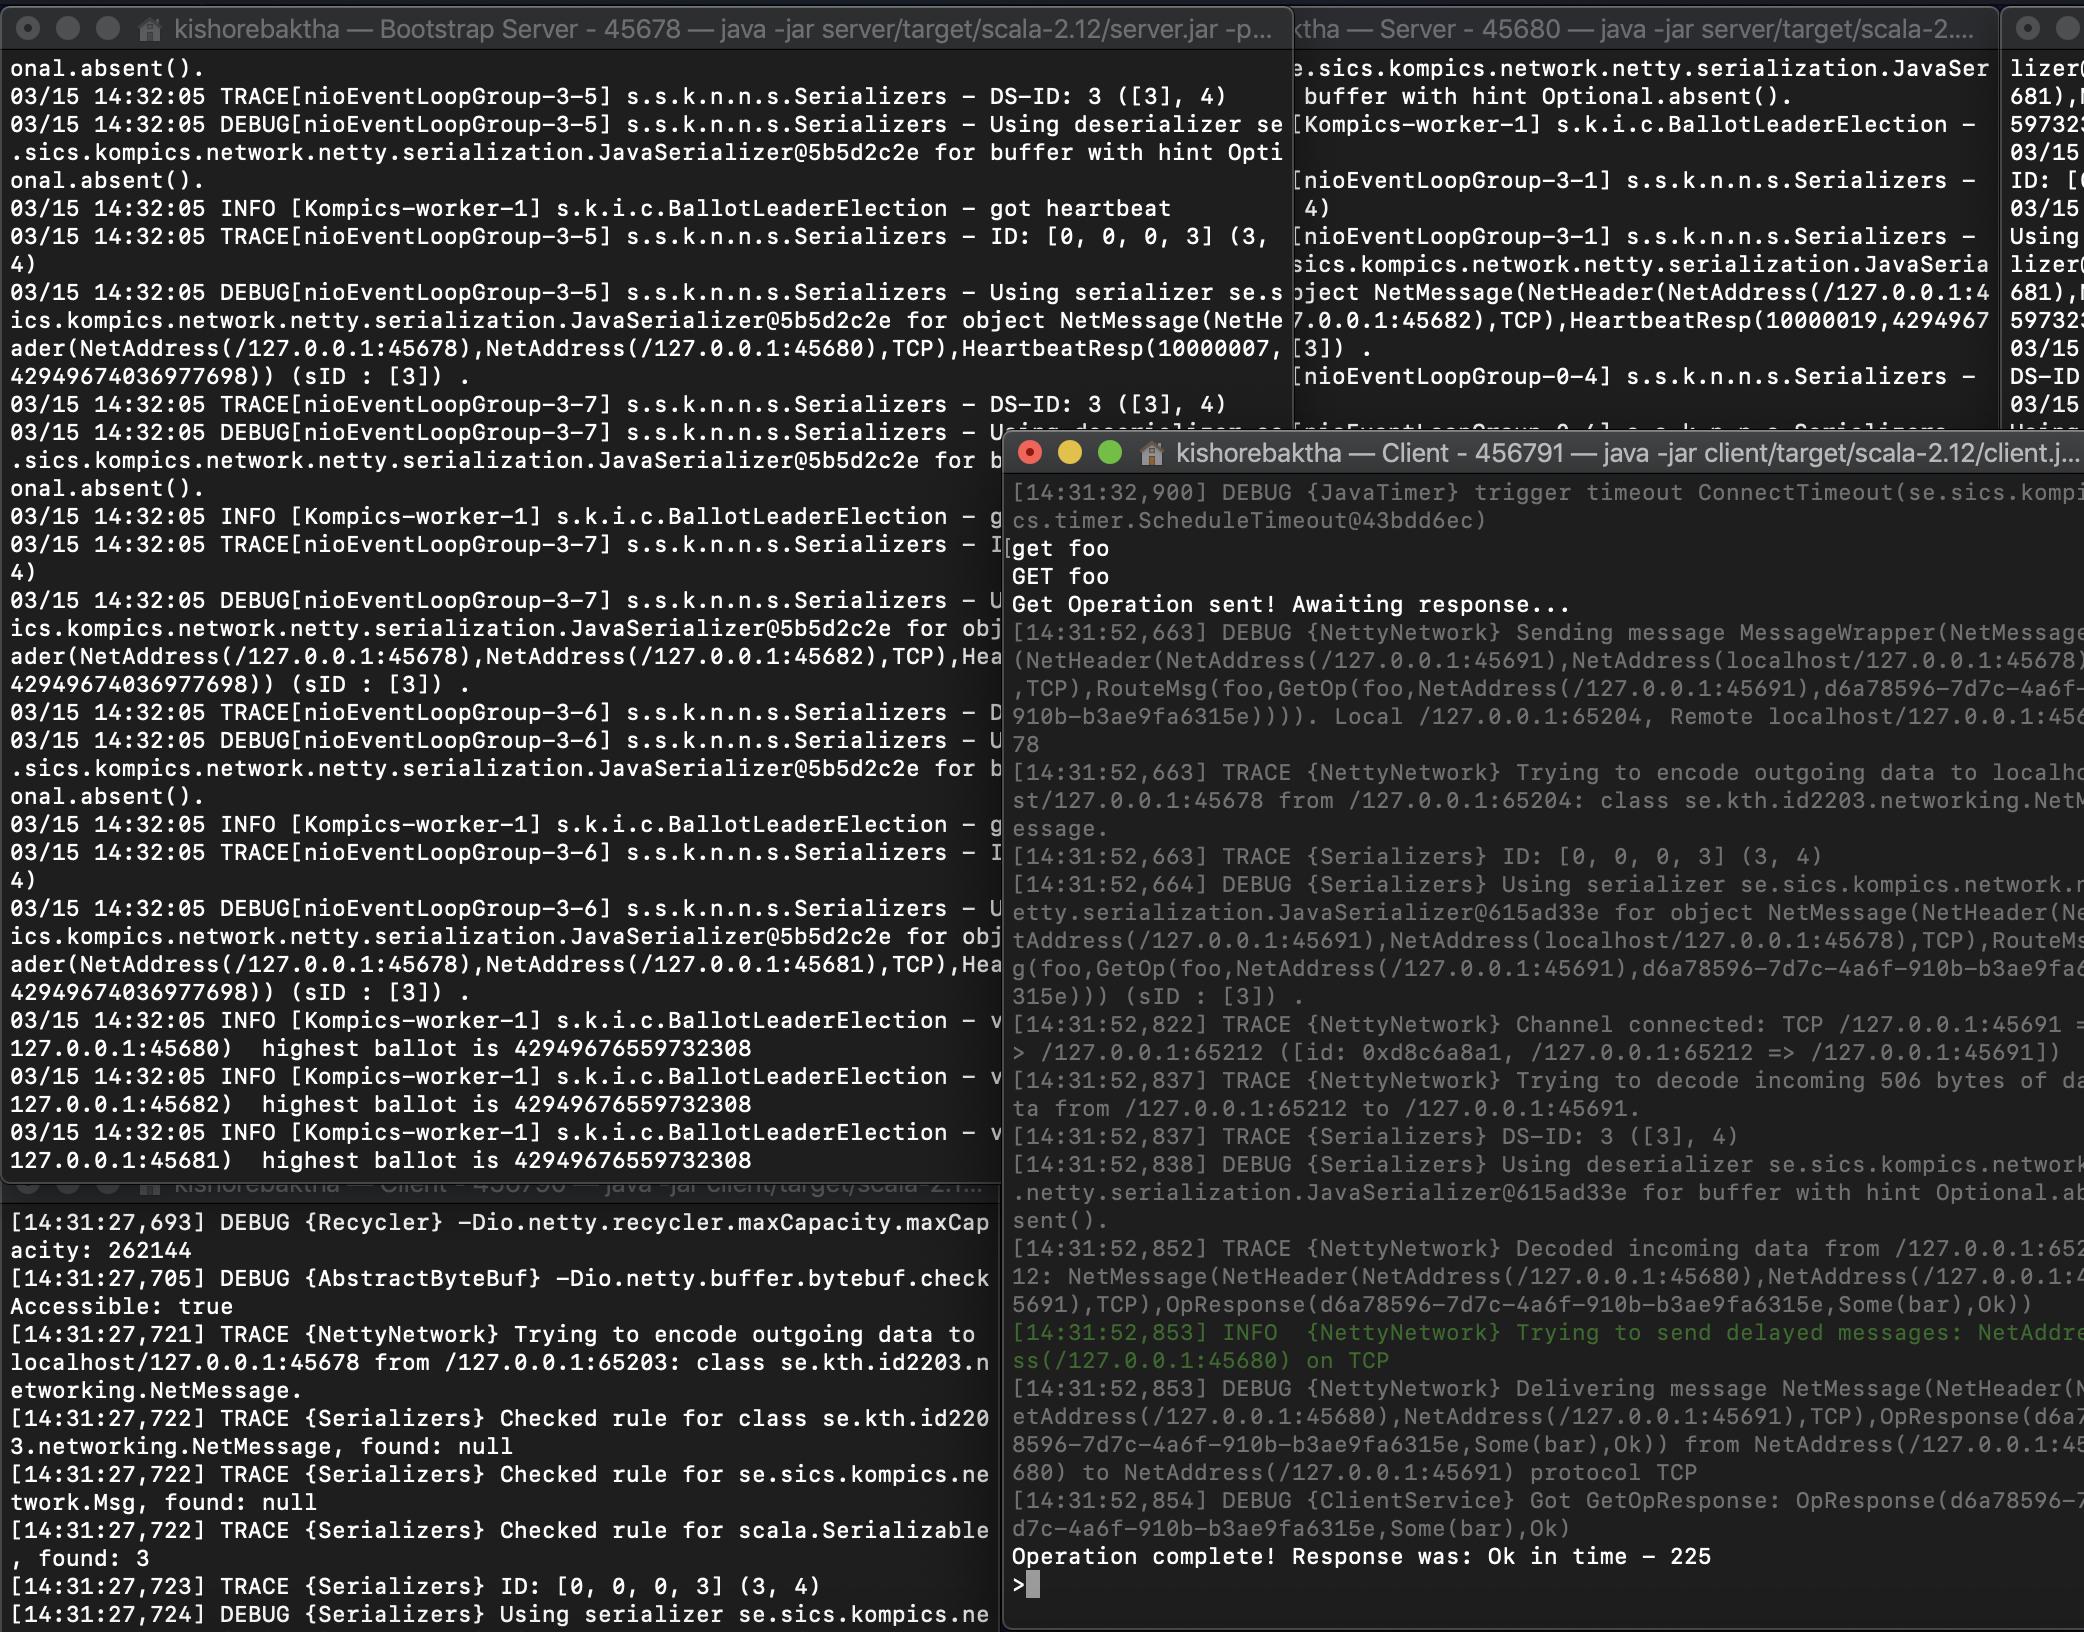 Screenshot 2019-03-15 at 2 33 08 PM